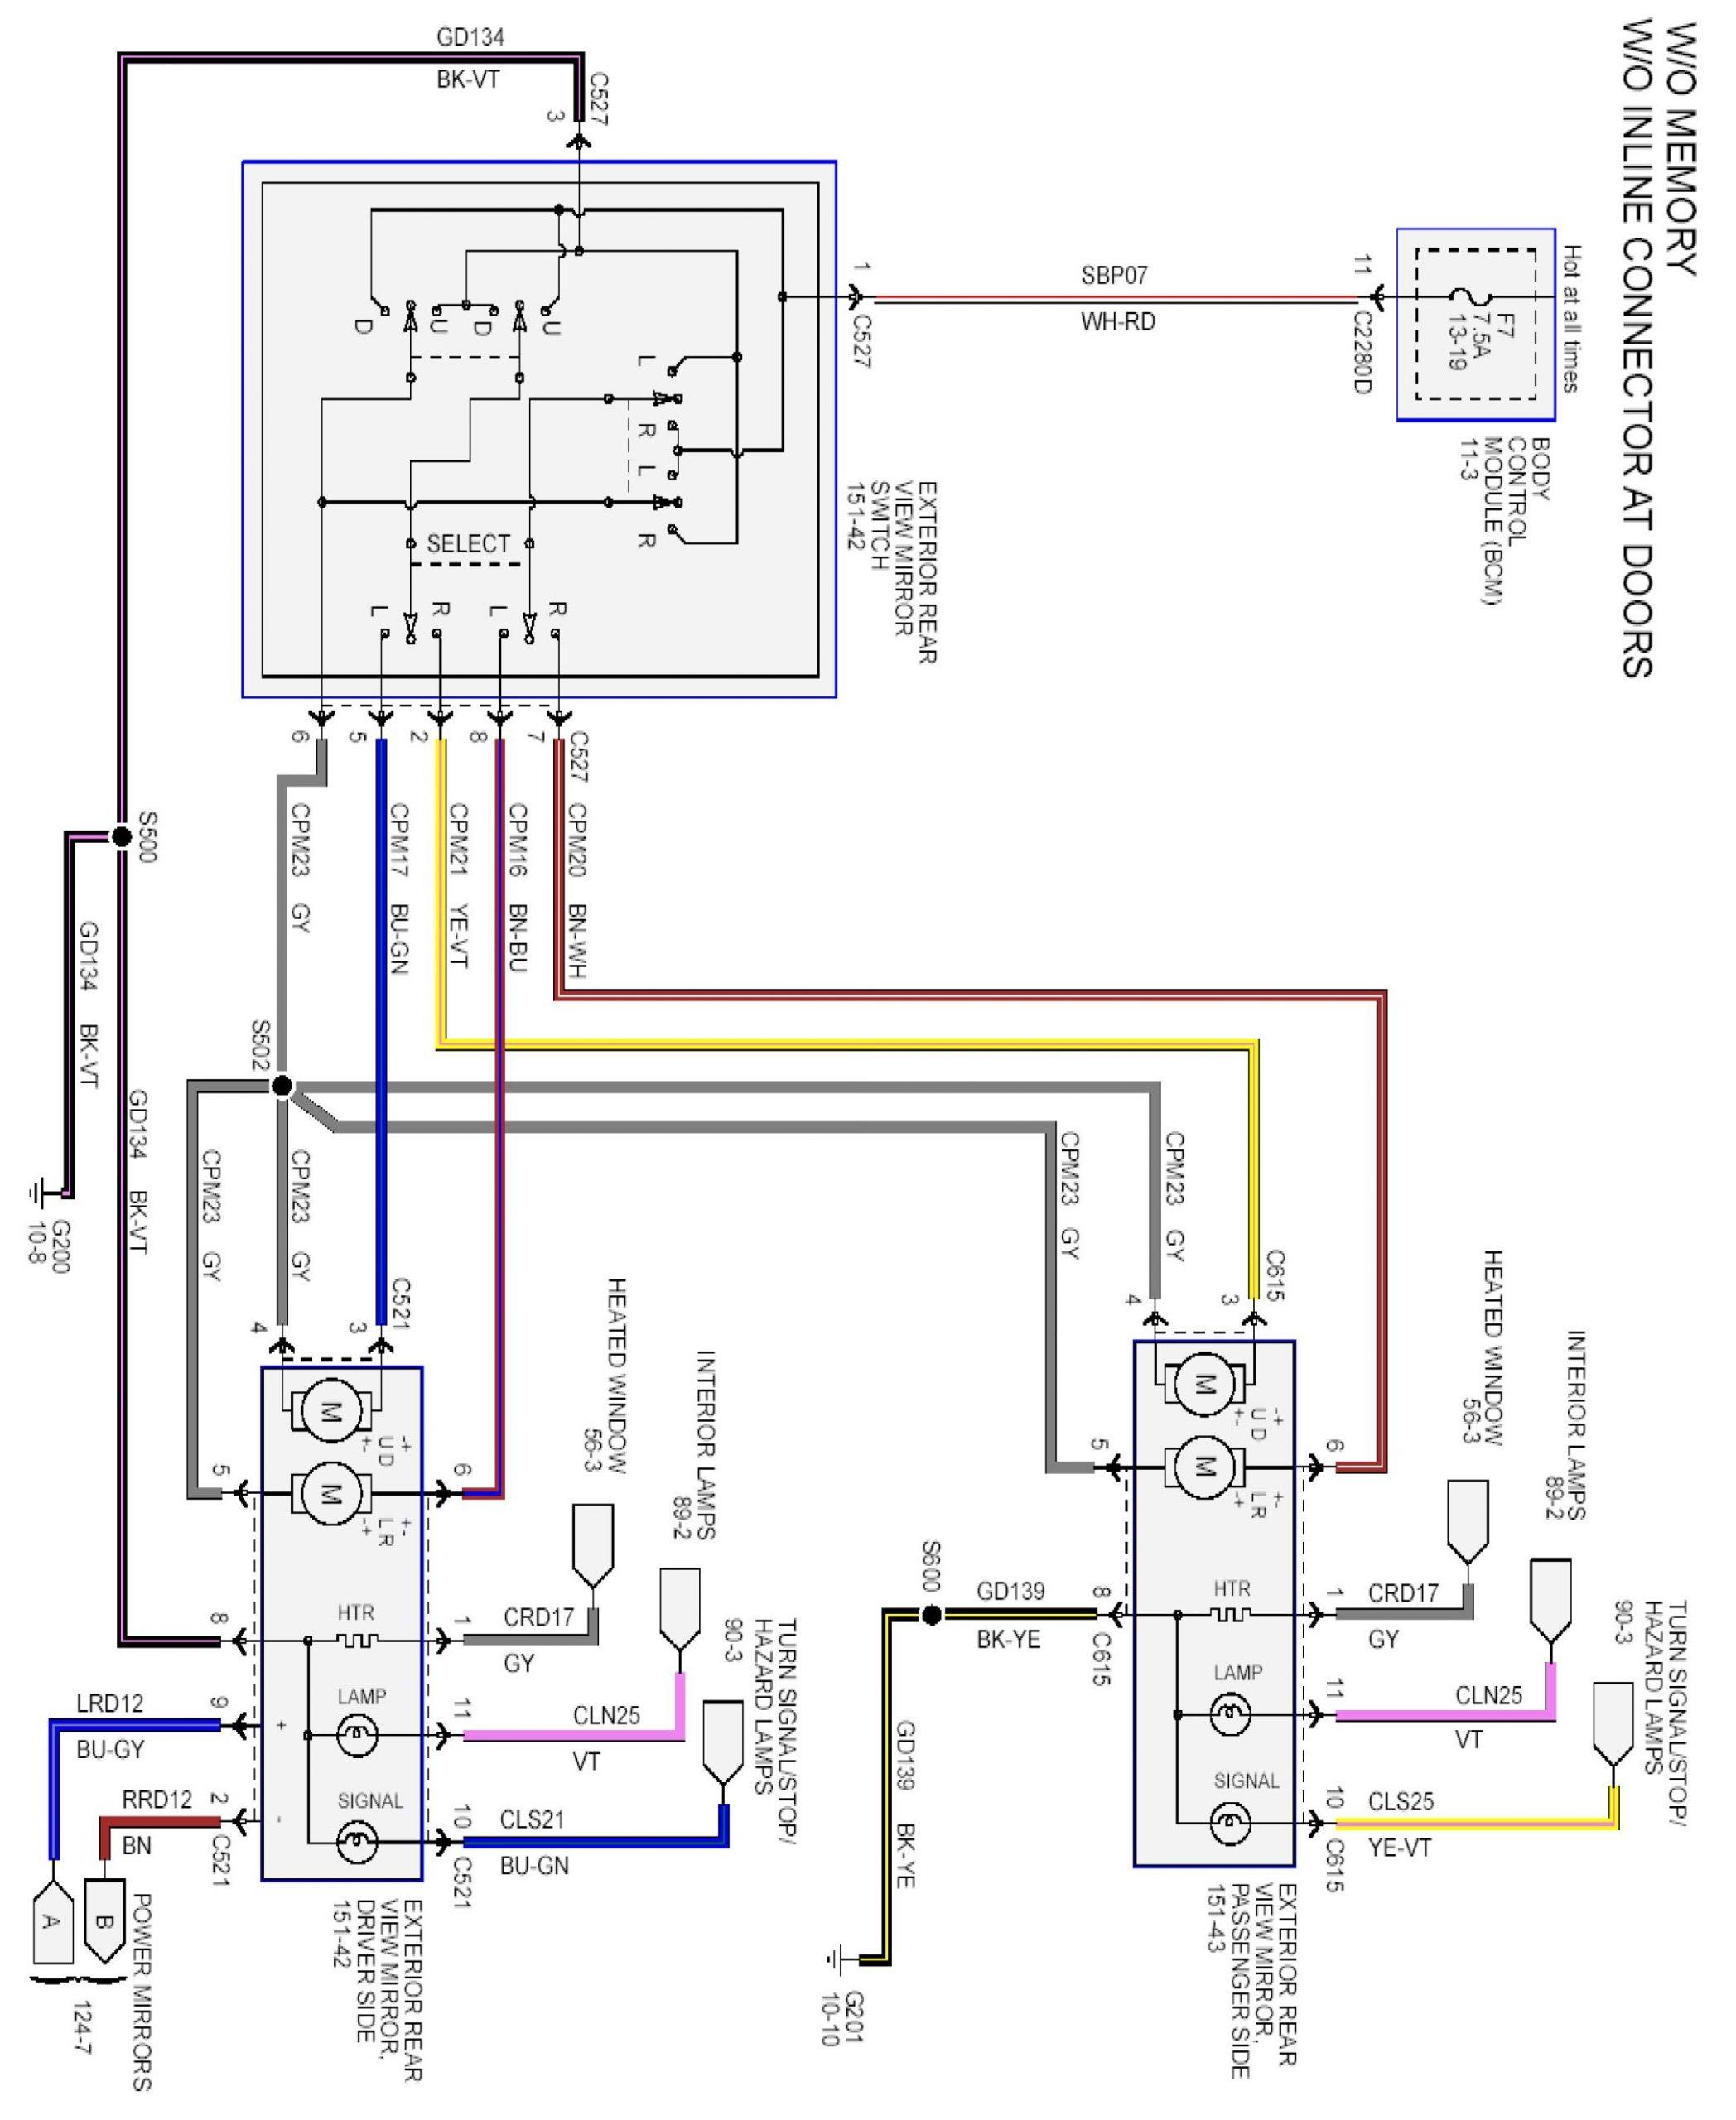 tbb heated mirror wiring diagram